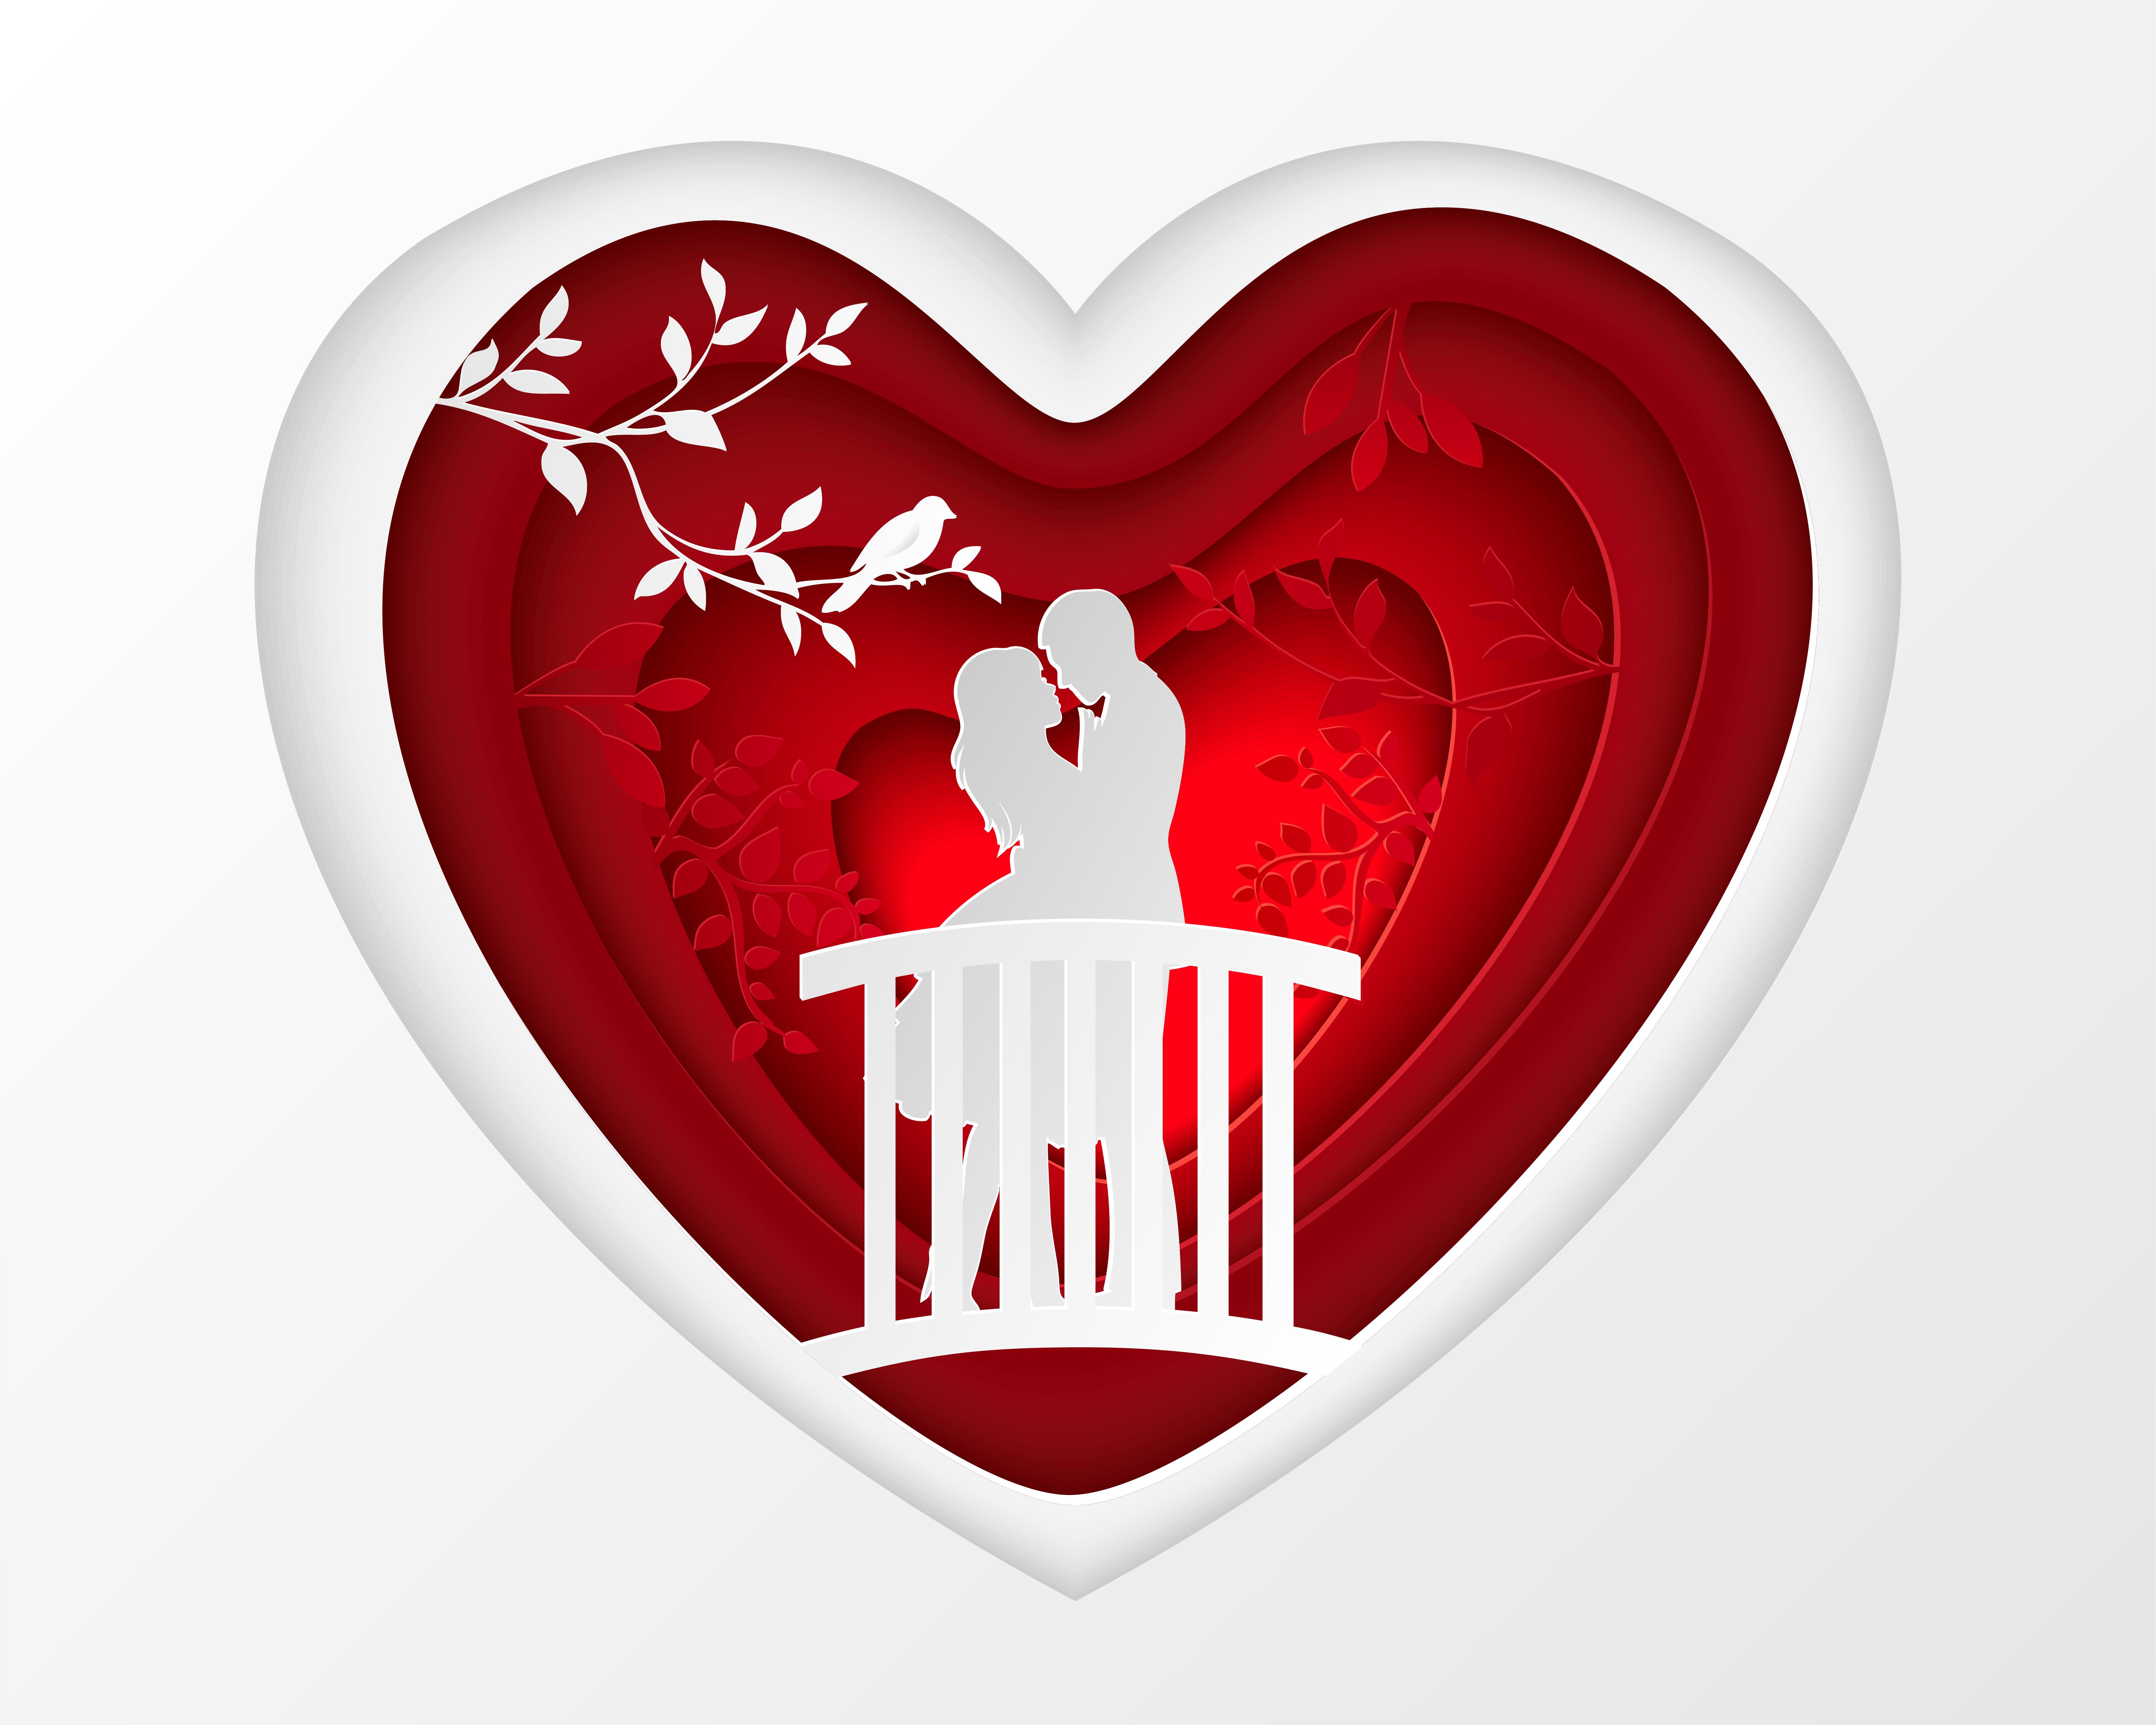 Gratis Dating - 100% Kostenlos Flirten & Chatten | Gzhatrs Profil